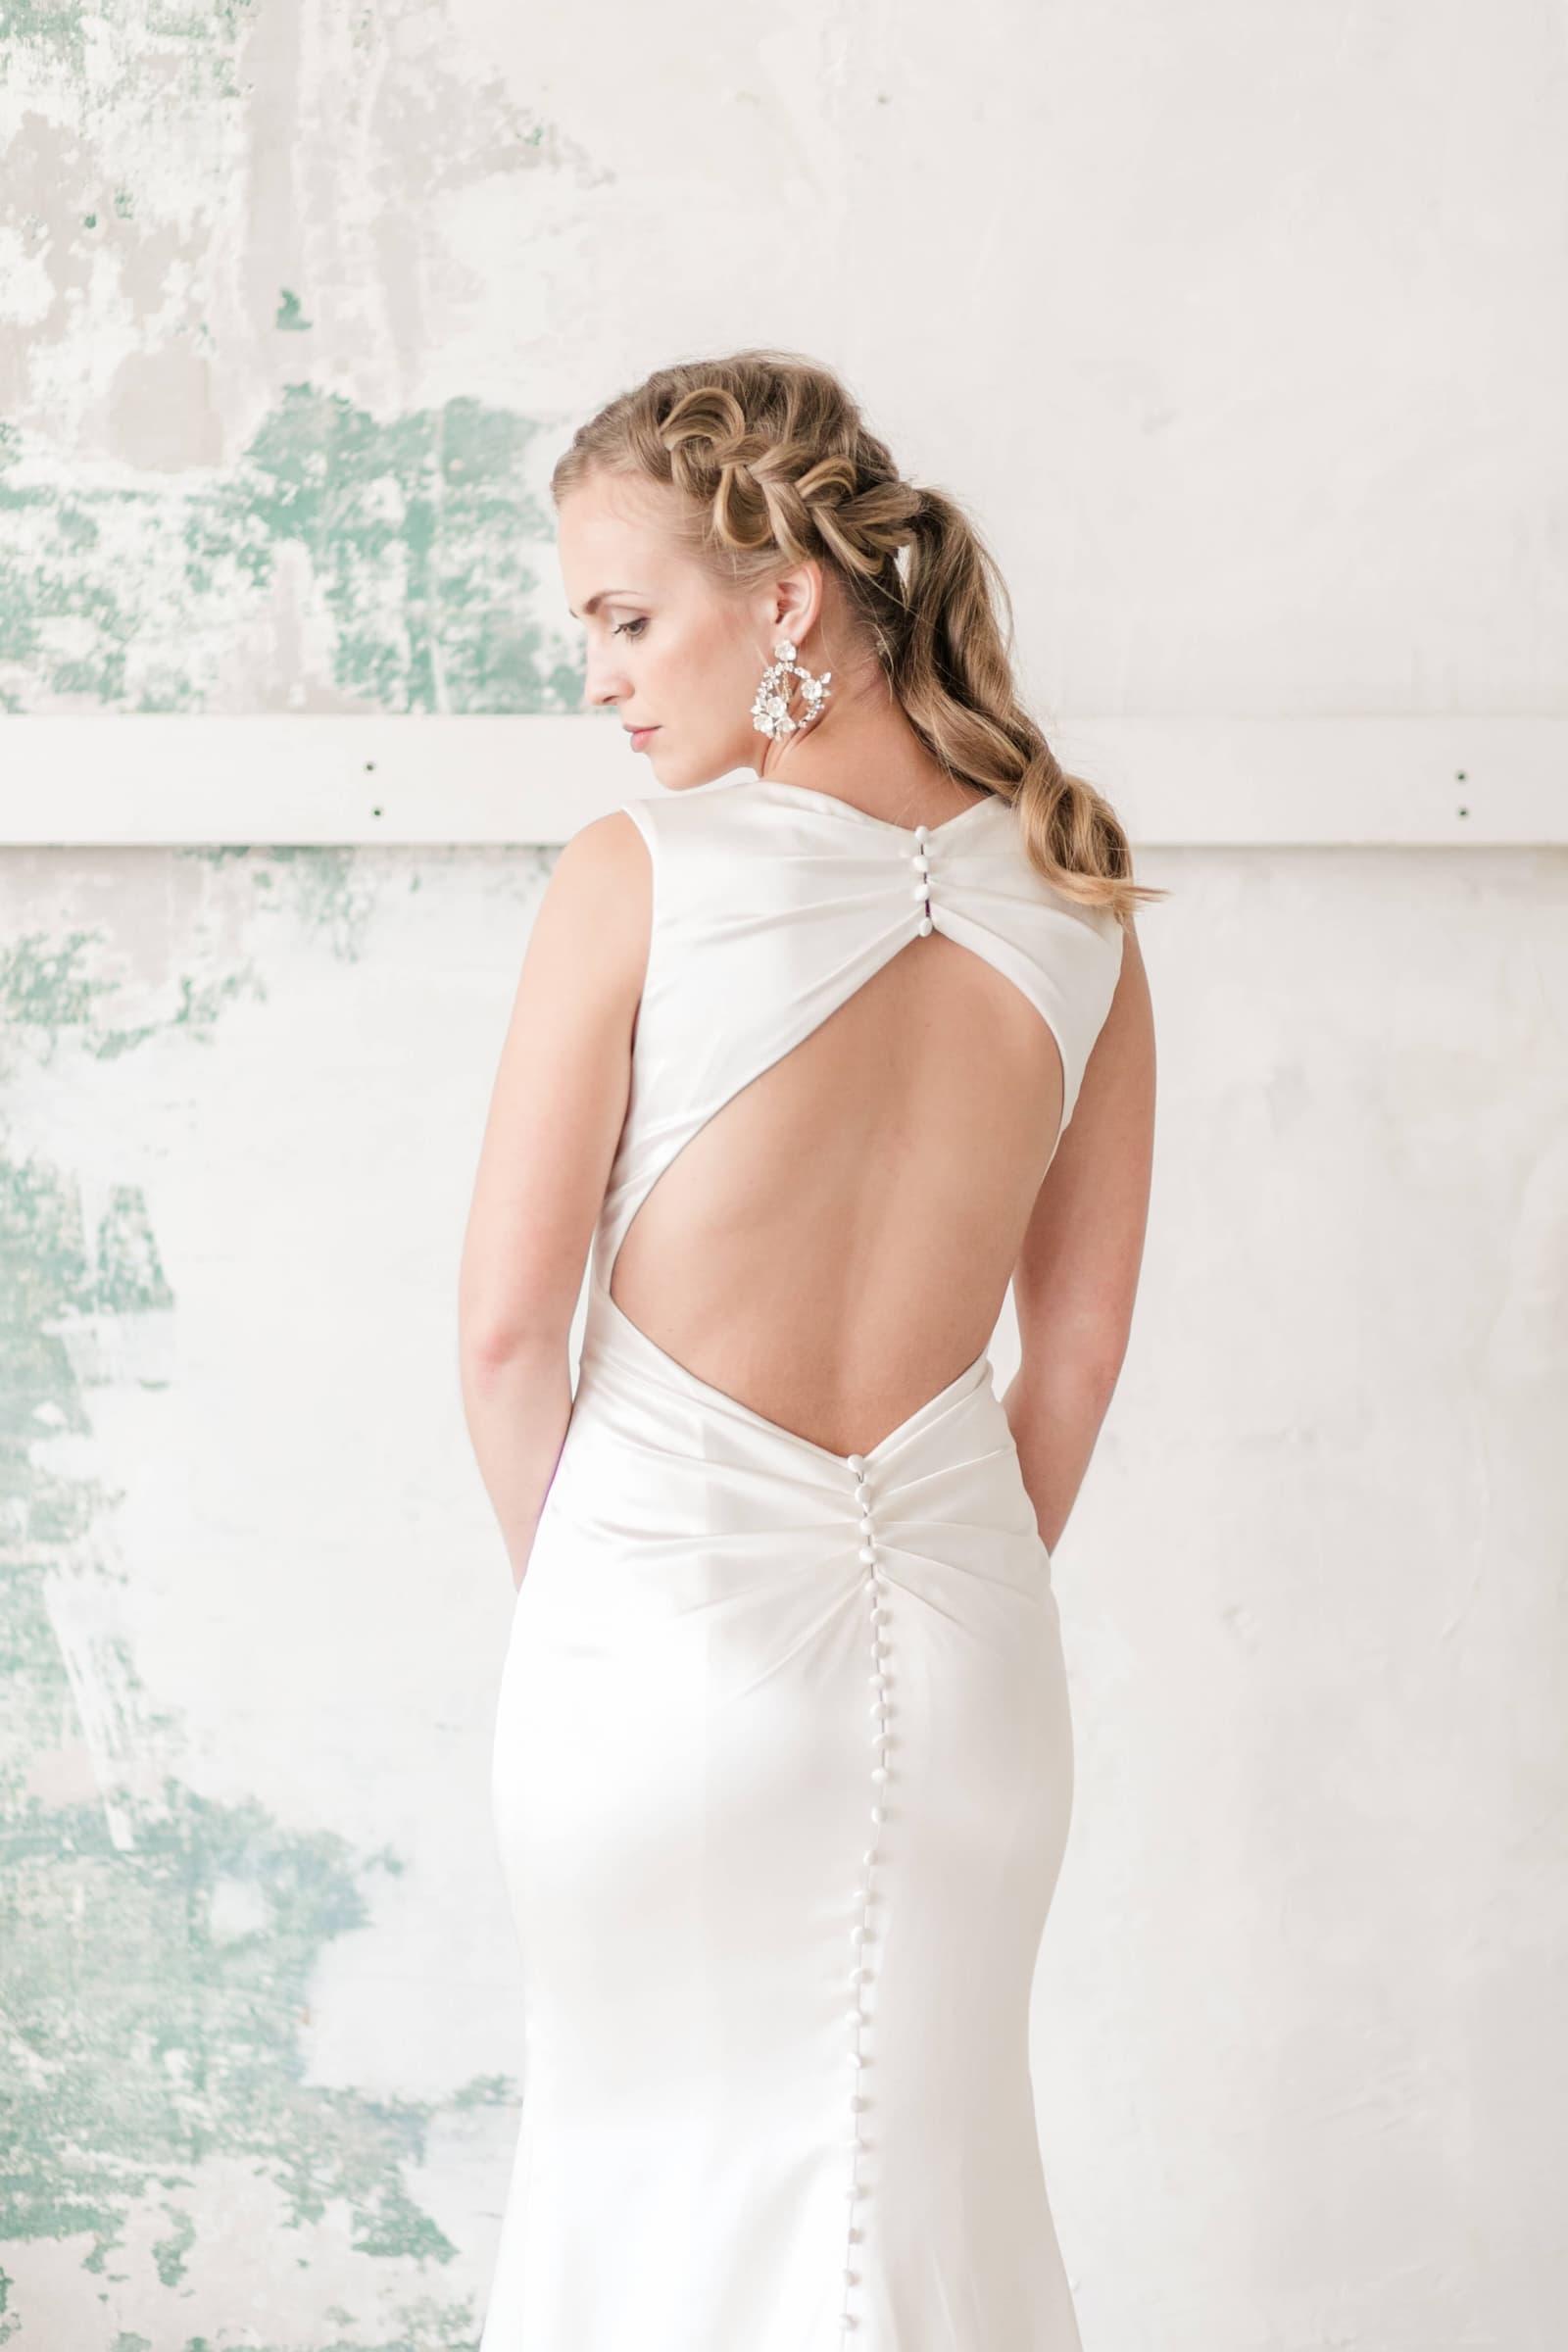 wedding dress jacksonville beach florida bride low back